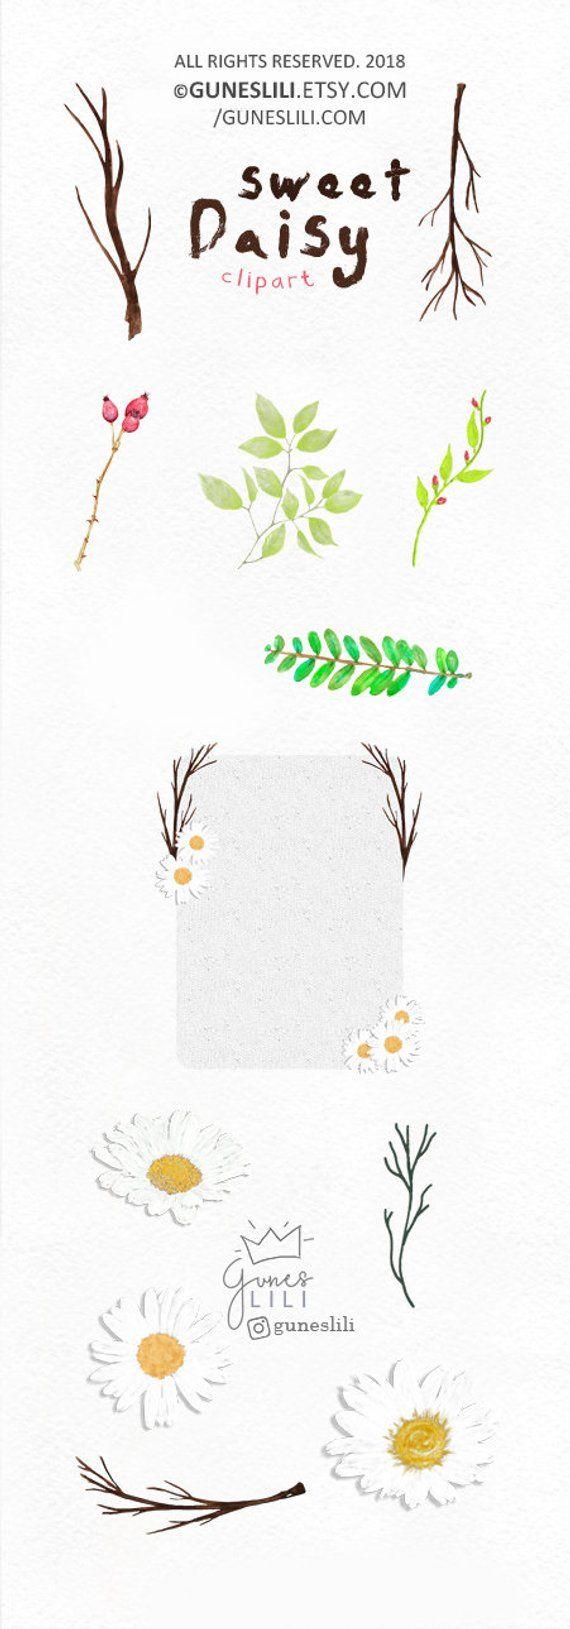 Pin by gunes lili on watercolor floral clip art packs by gunes lili daisy flower clipart boho floral clipart white flower clipart digital download wedding clipart wreath clipart acrylic flowers clipart izmirmasajfo